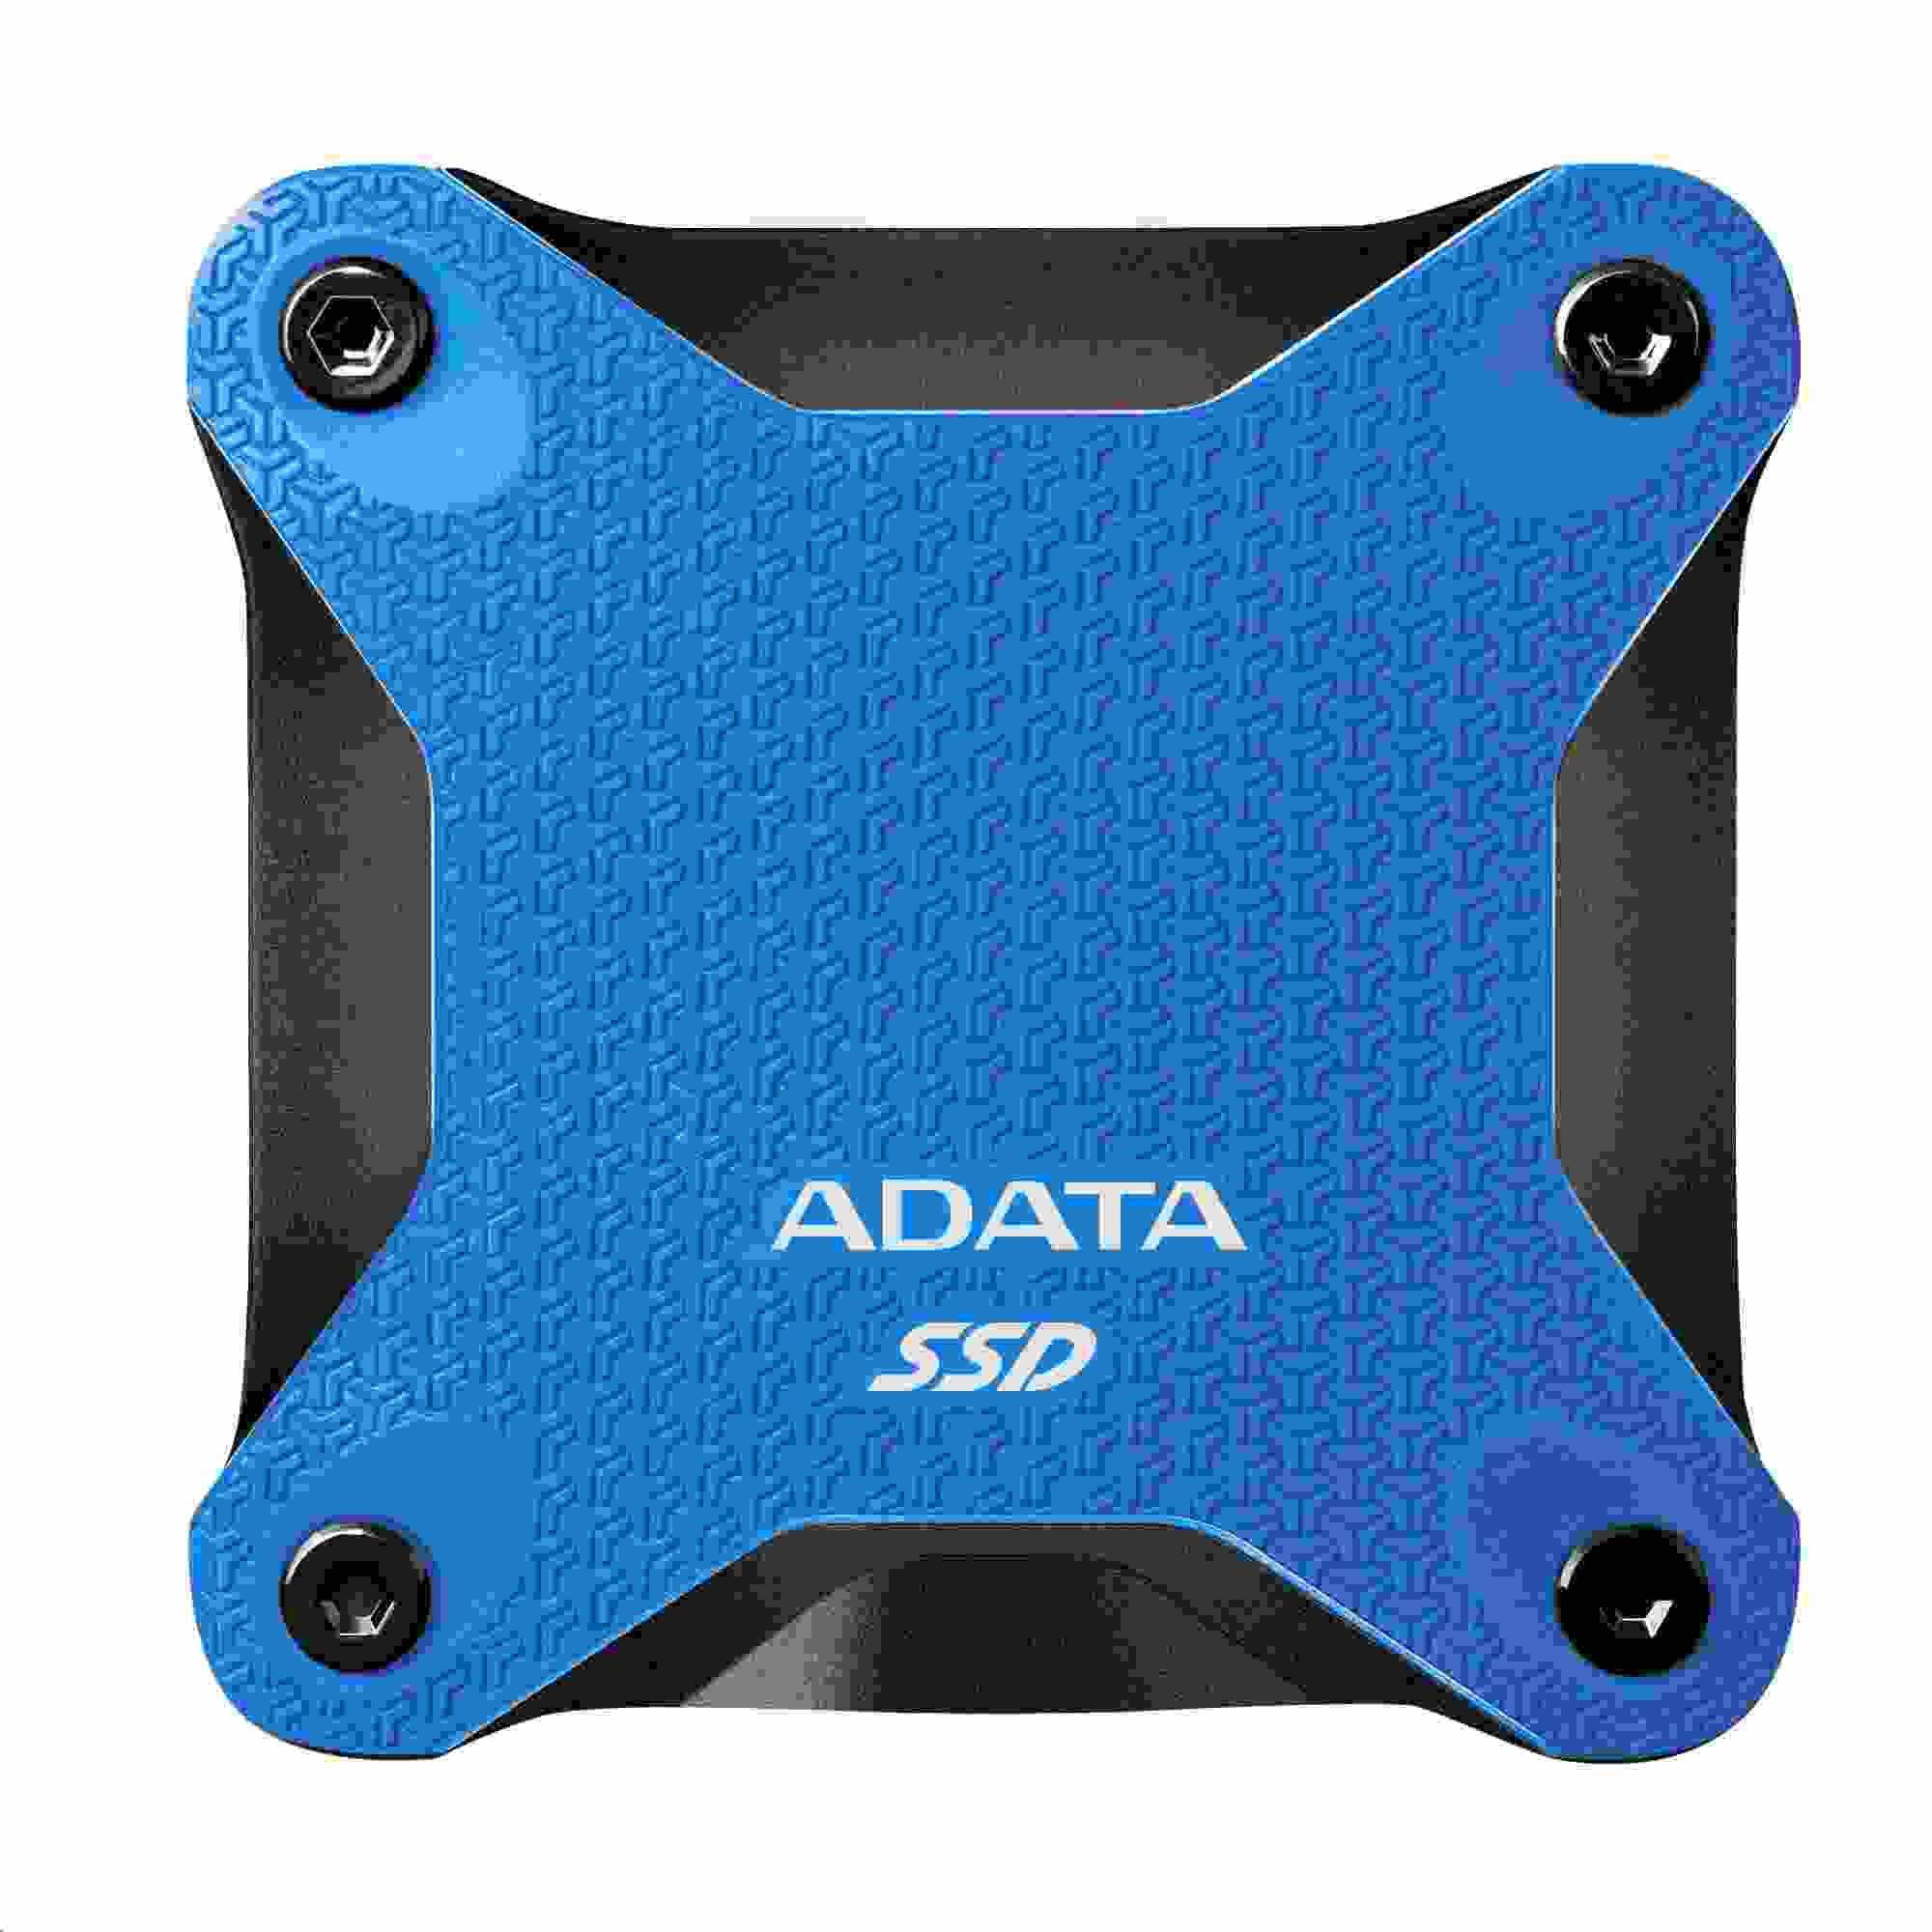 ADATA External SSD 240GB ASD600Q USB 3.1 modrá